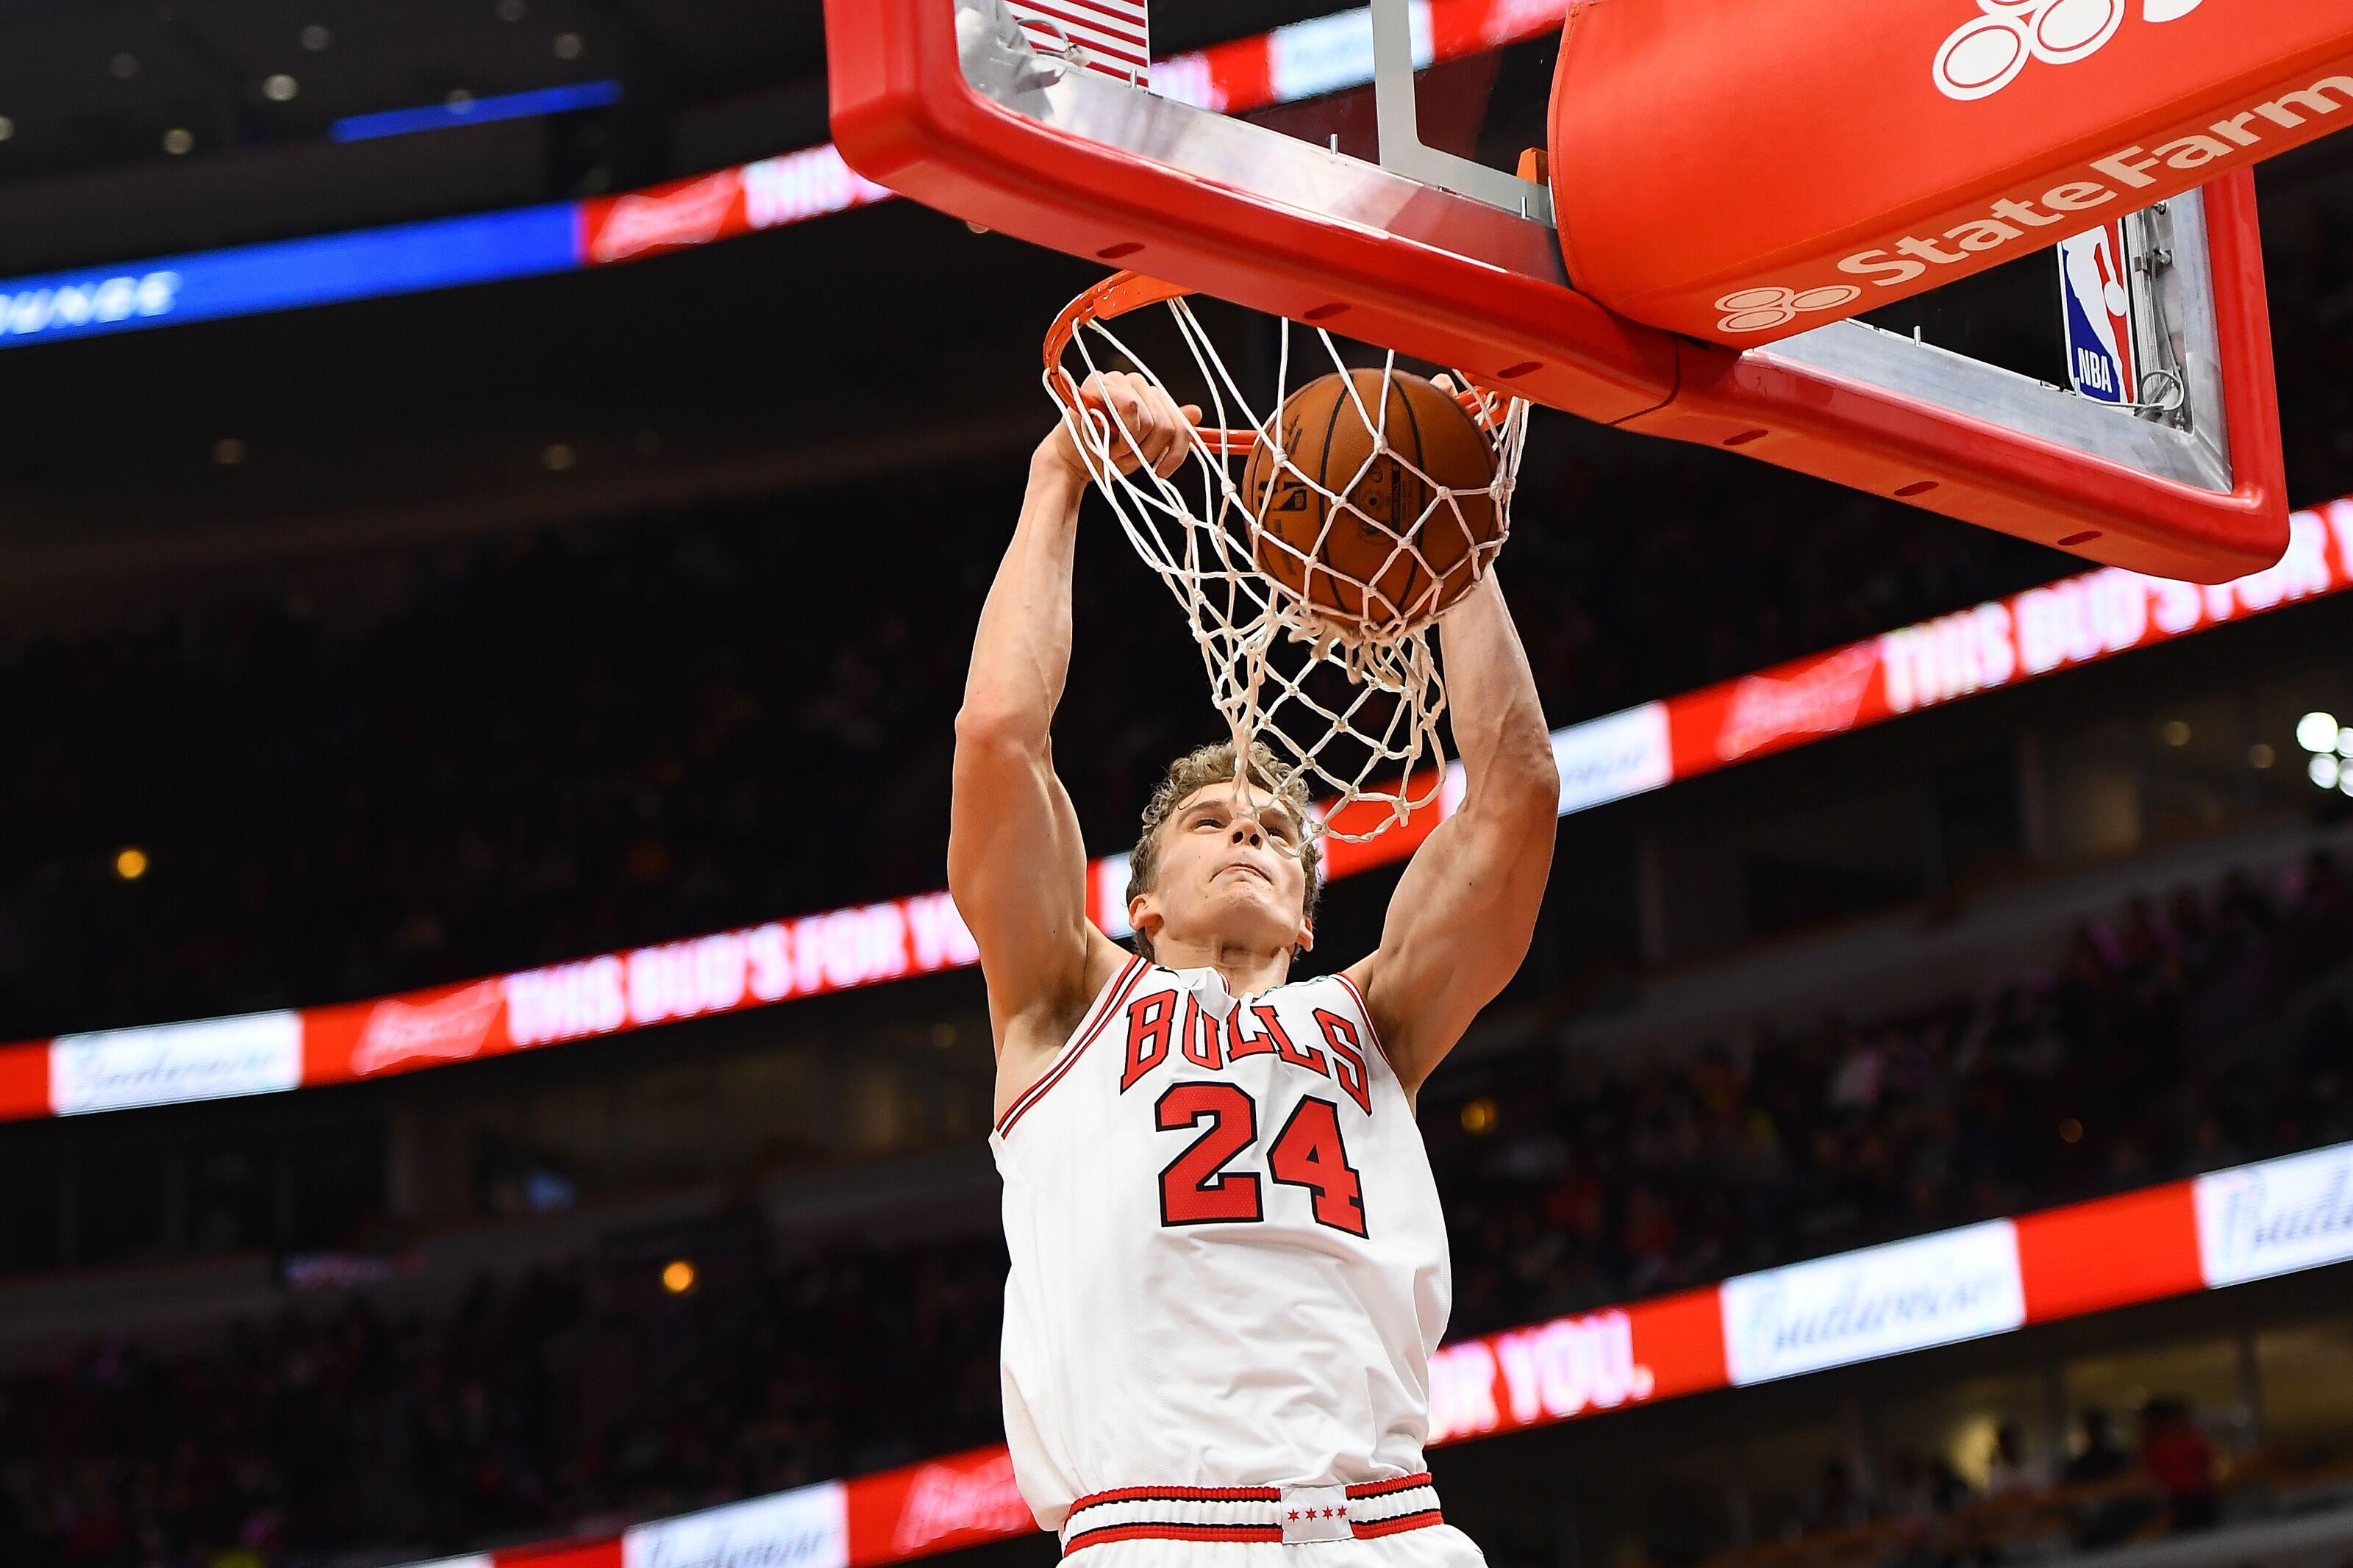 Chicago Bulls: Lauri Markkanen needs to shoot more